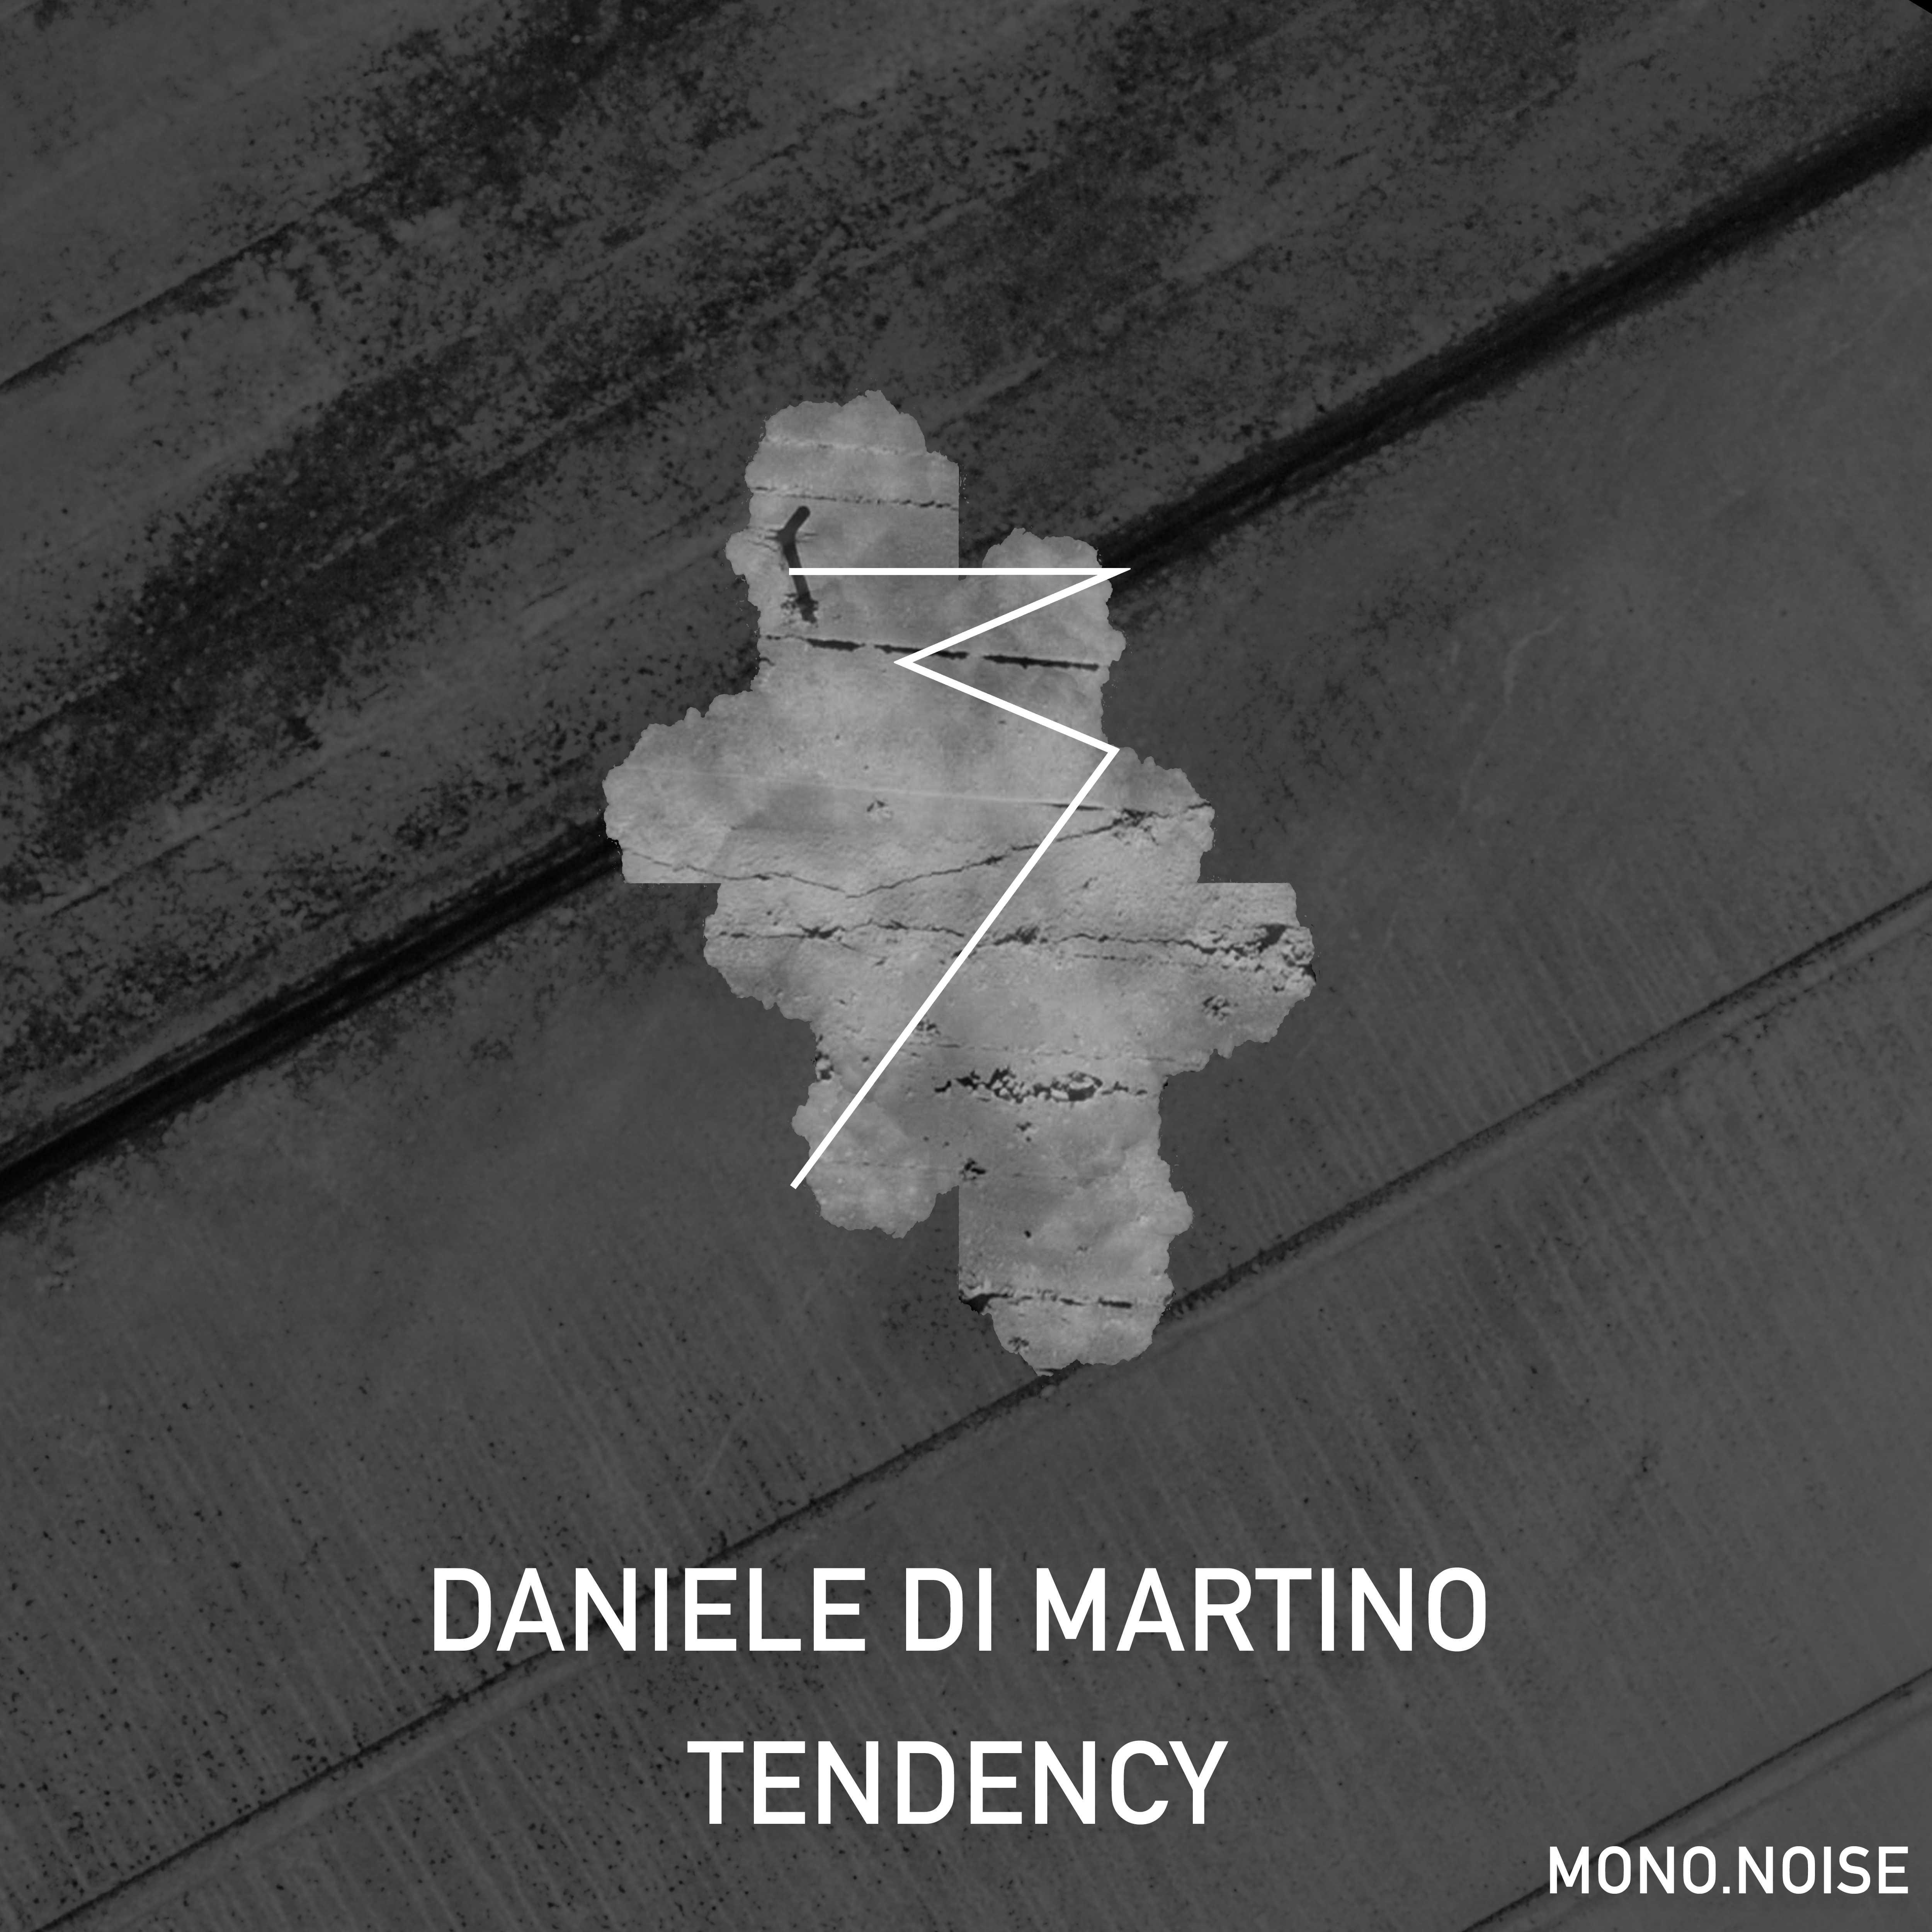 Daniele Di Martino – Tendency (MUUI Remix)(MONO.NOISE)